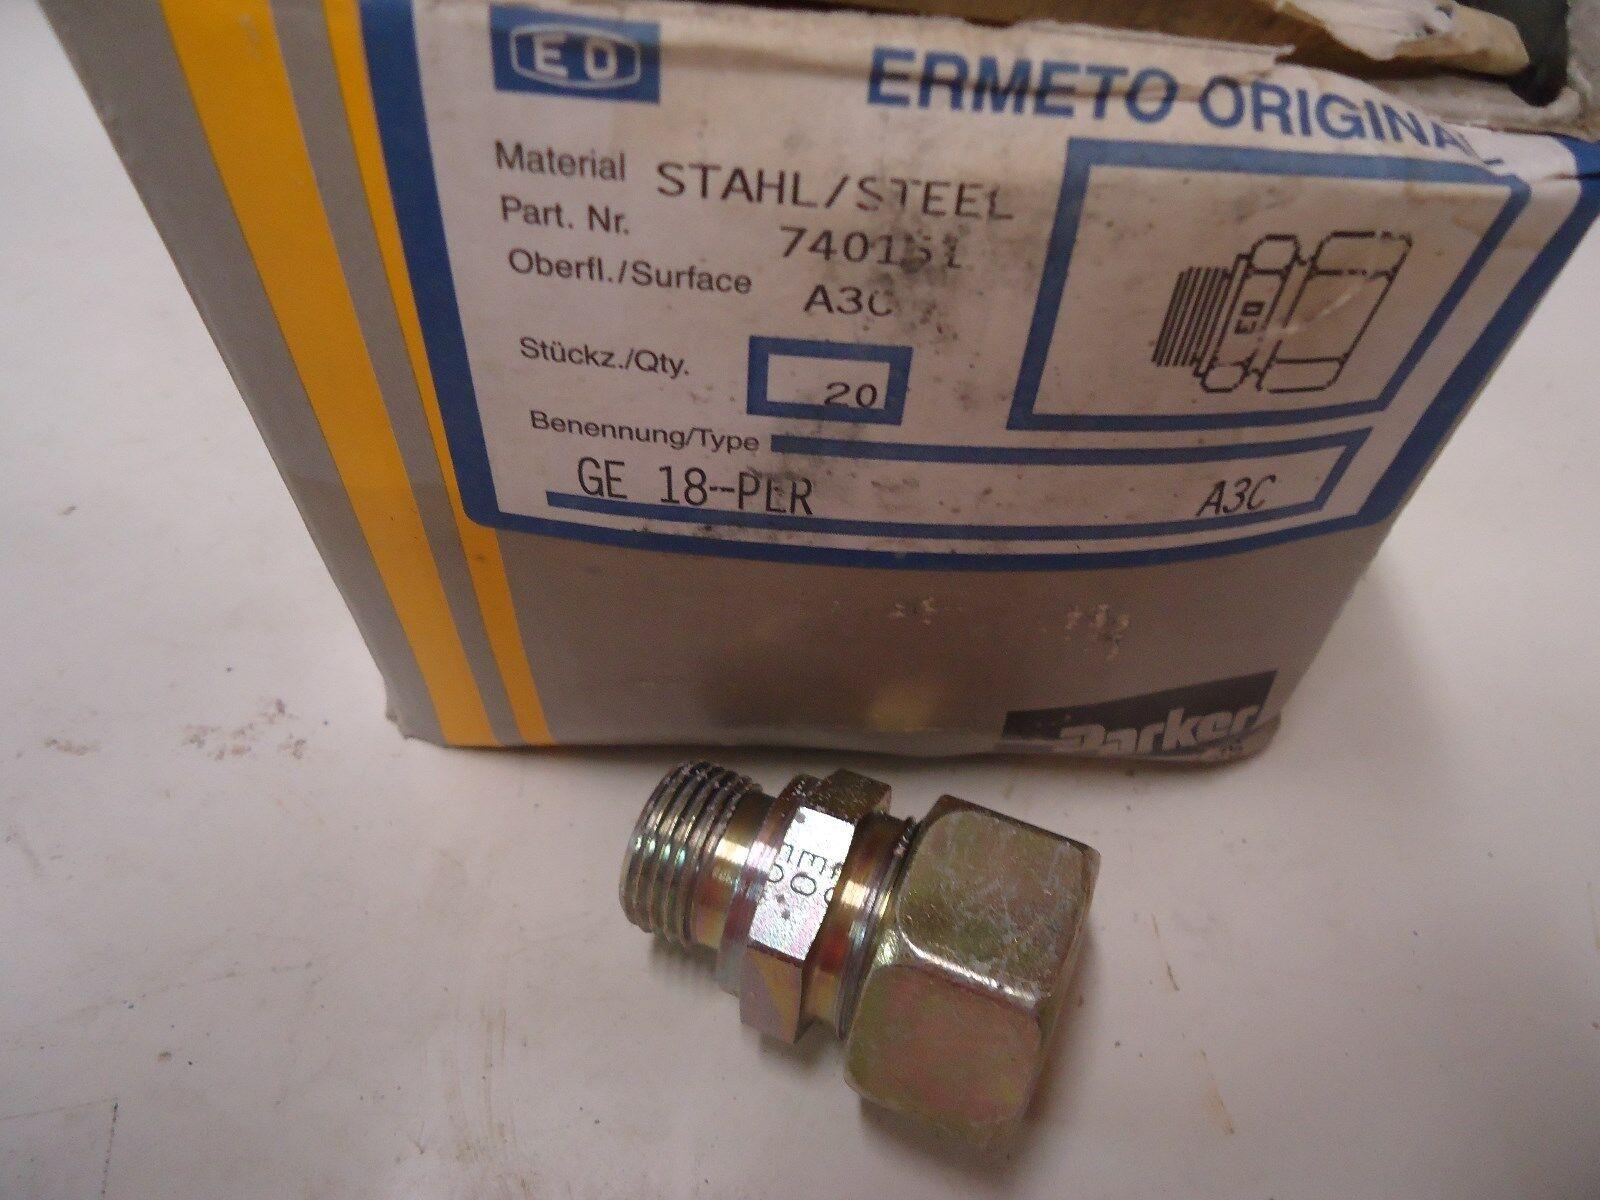 PARKER ERMETO STAHL STEEL 740151 A3C GE 18-PER (20 per box)